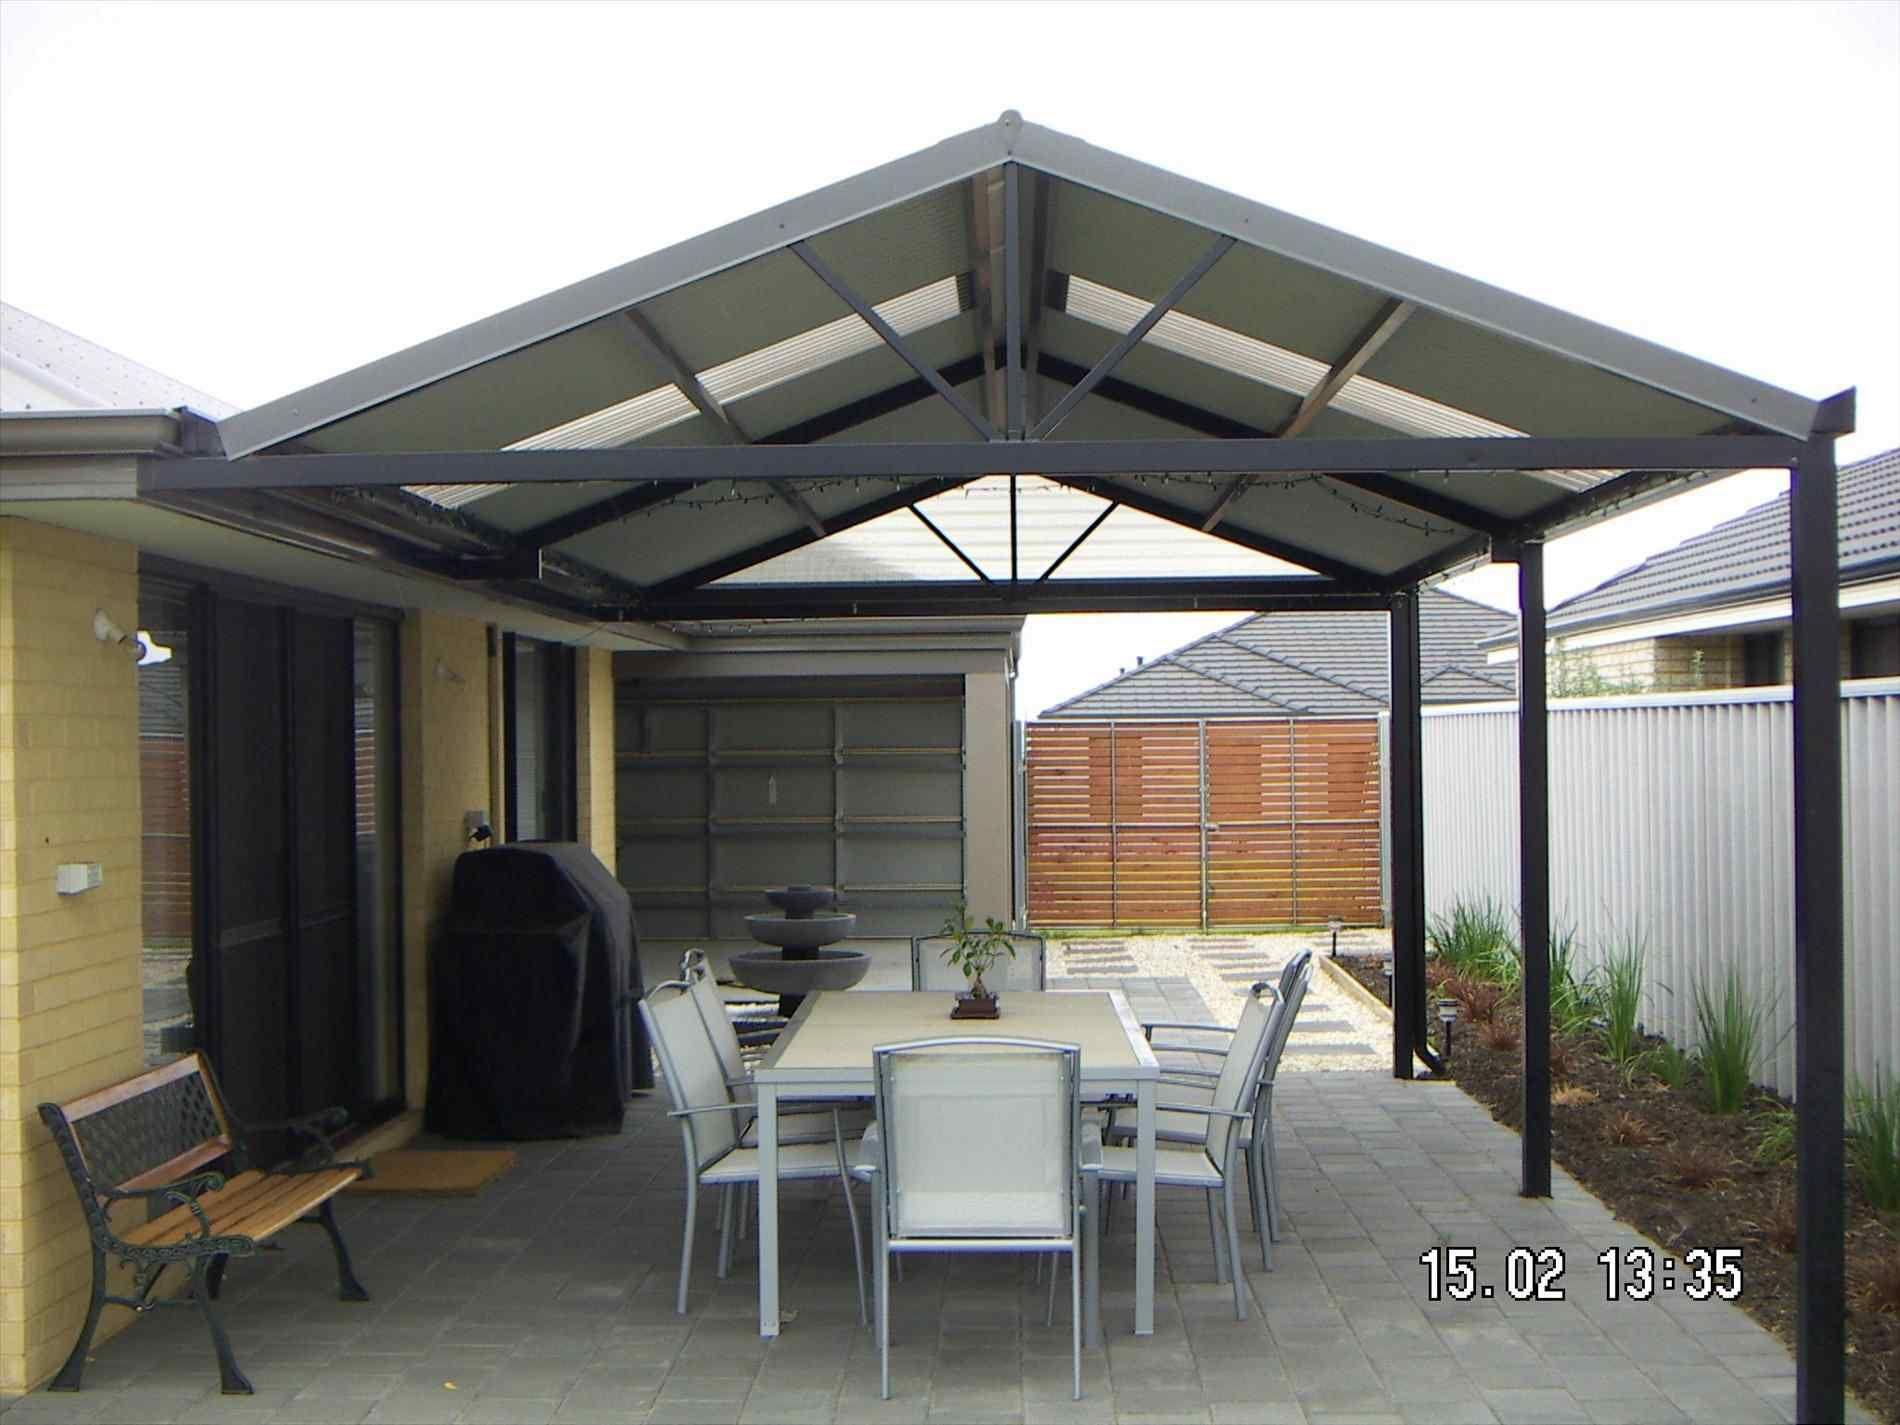 Verandah Roof Designs Home Roof Ideas Rooftop Patio Design Patio Design Carport Patio